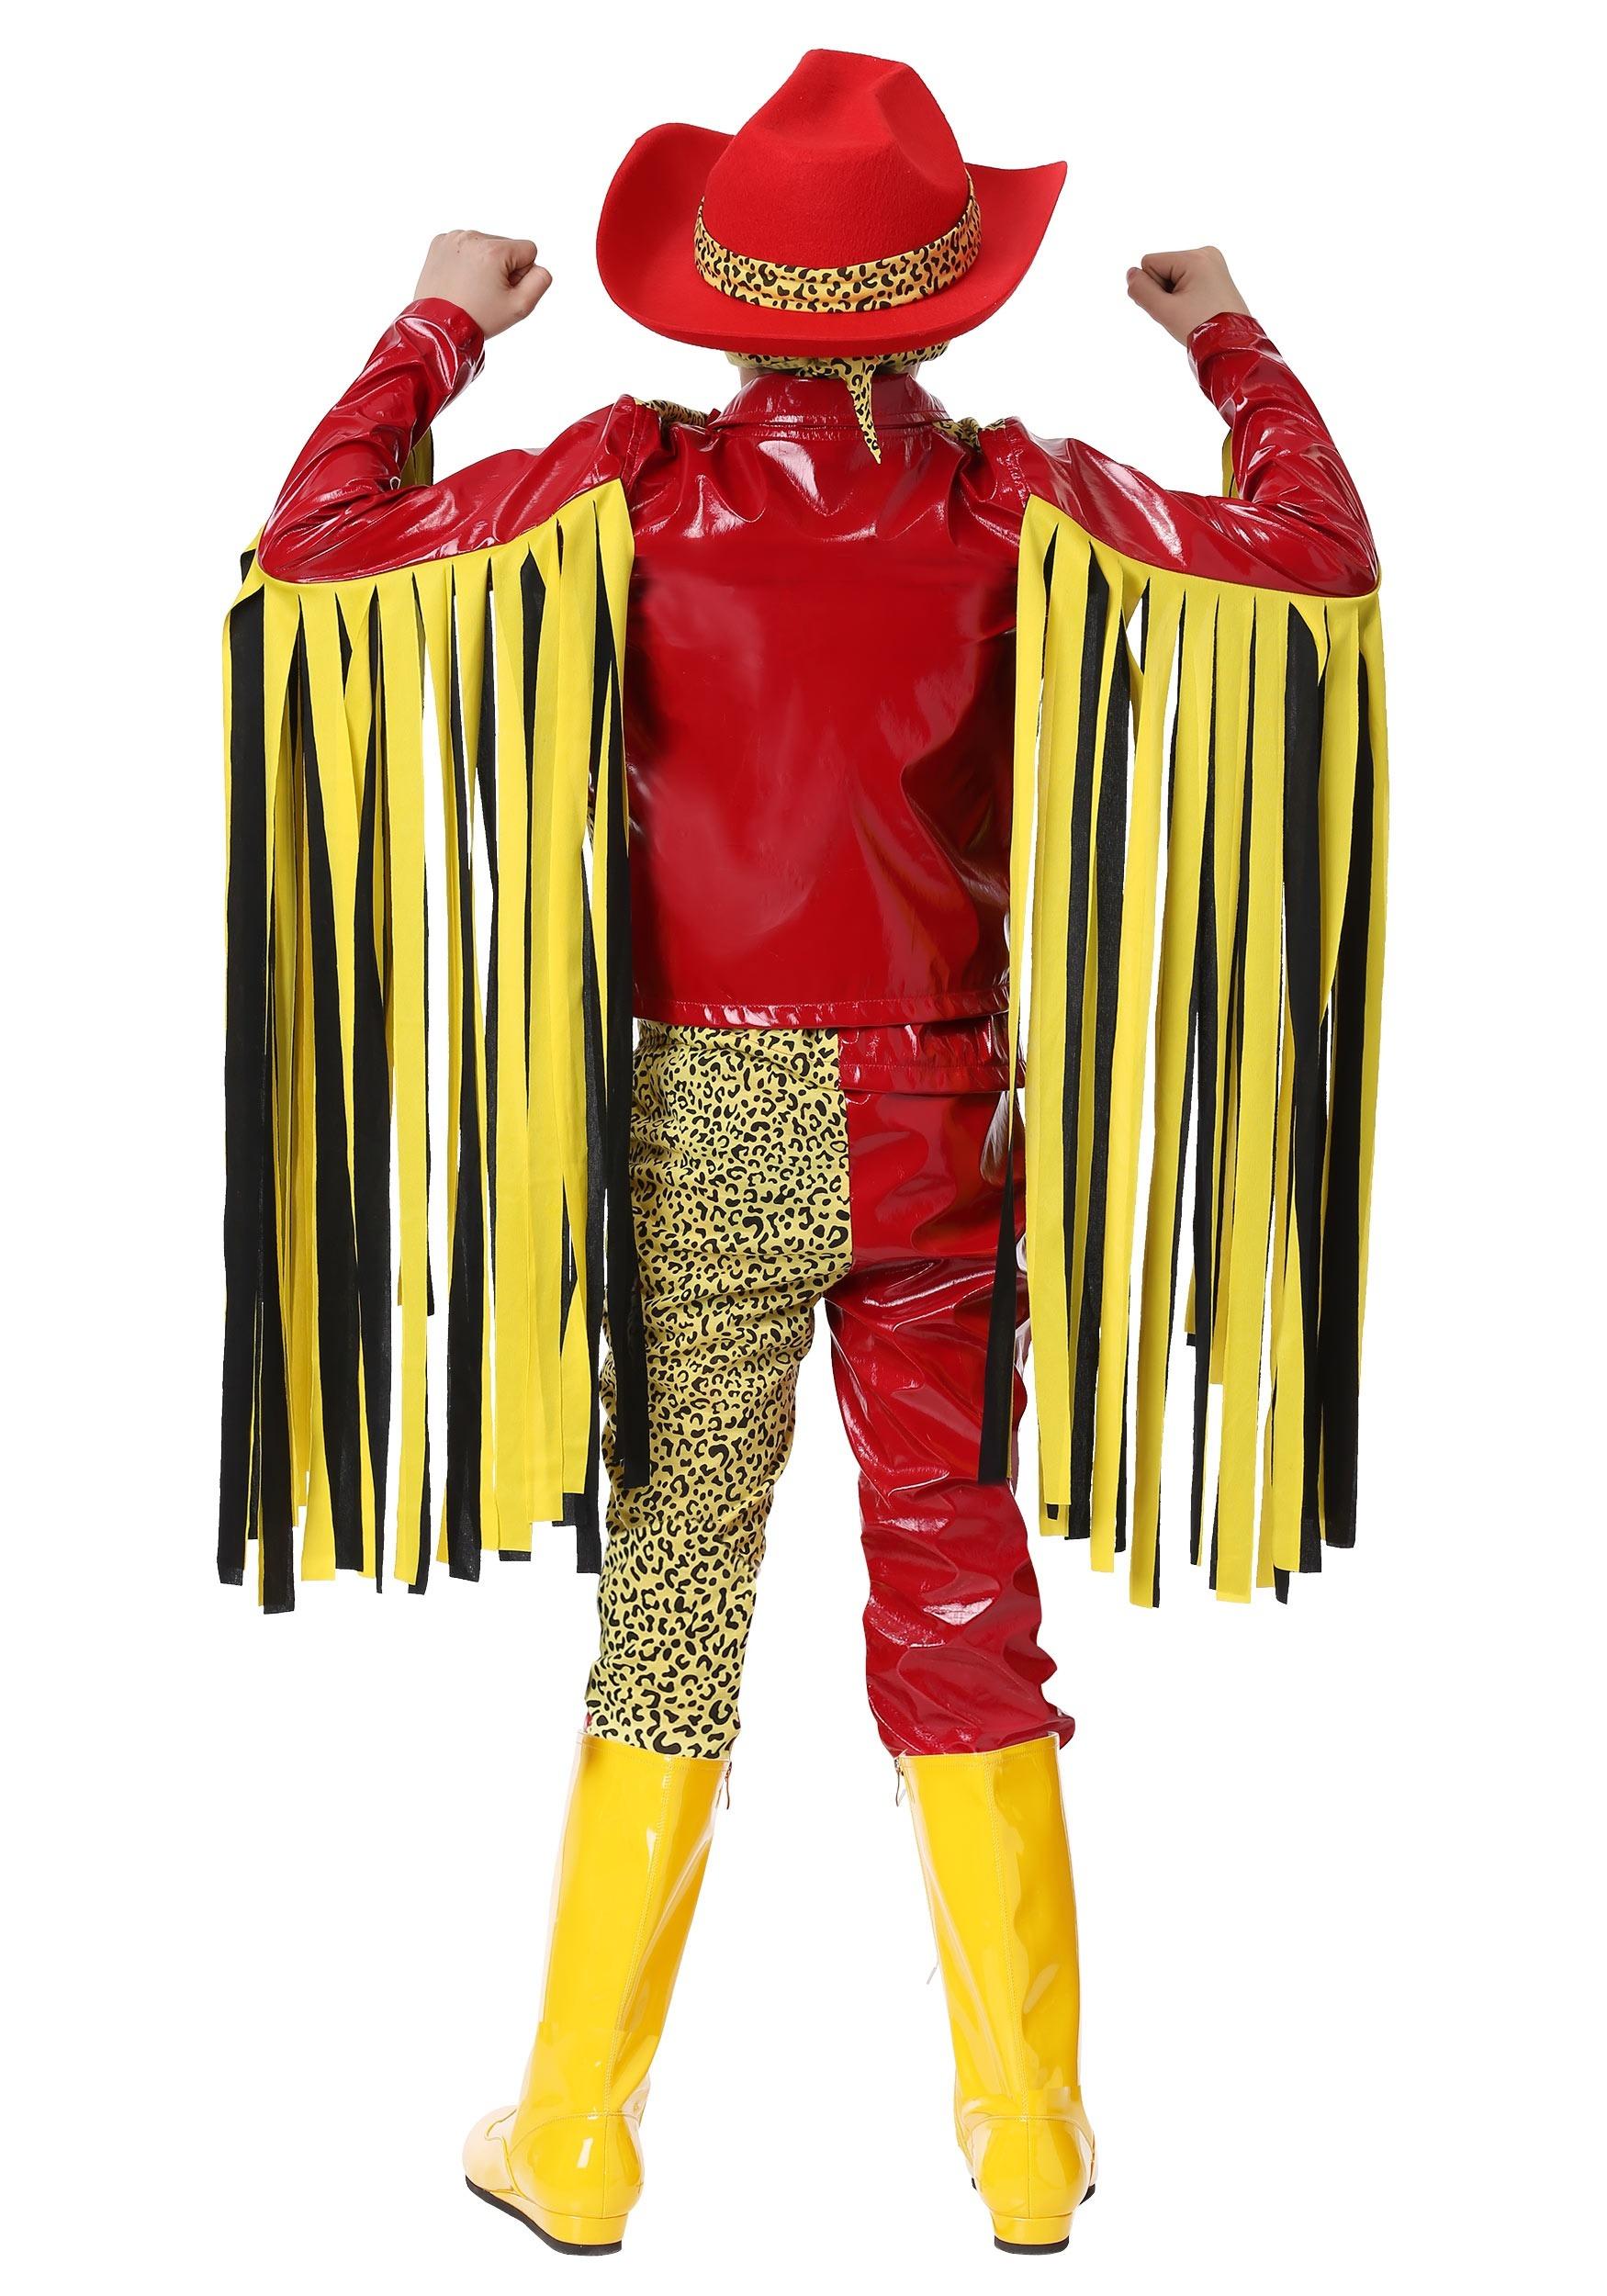 Macho Clothing Co: Macho Man Randy Savage Child Costume